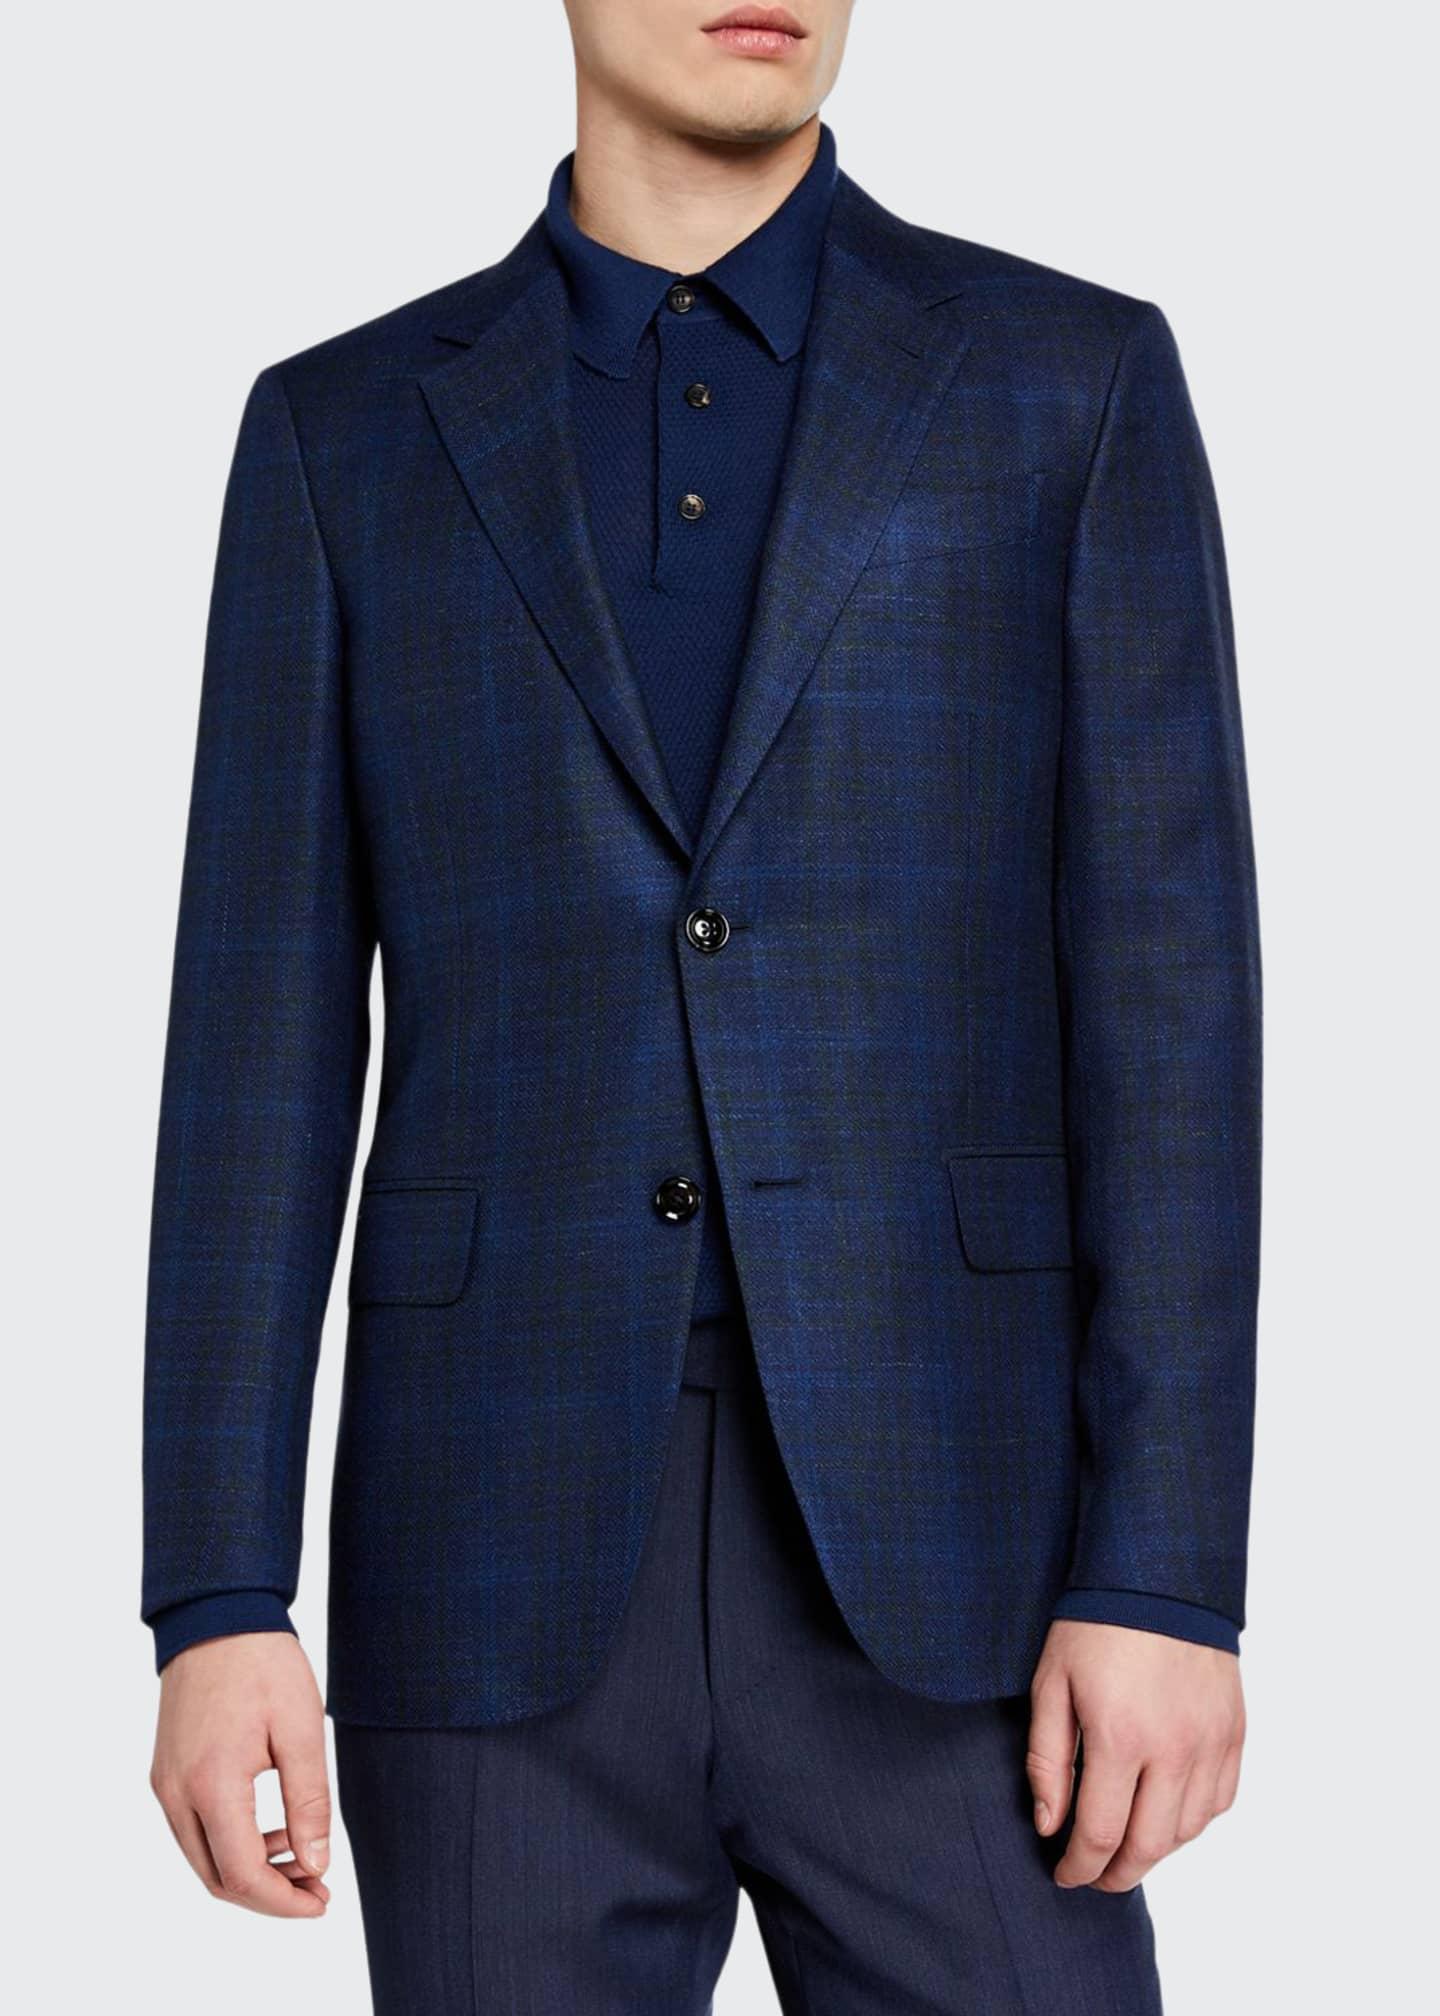 Ermenegildo Zegna Men's Cashmere Plaid Sport Coat